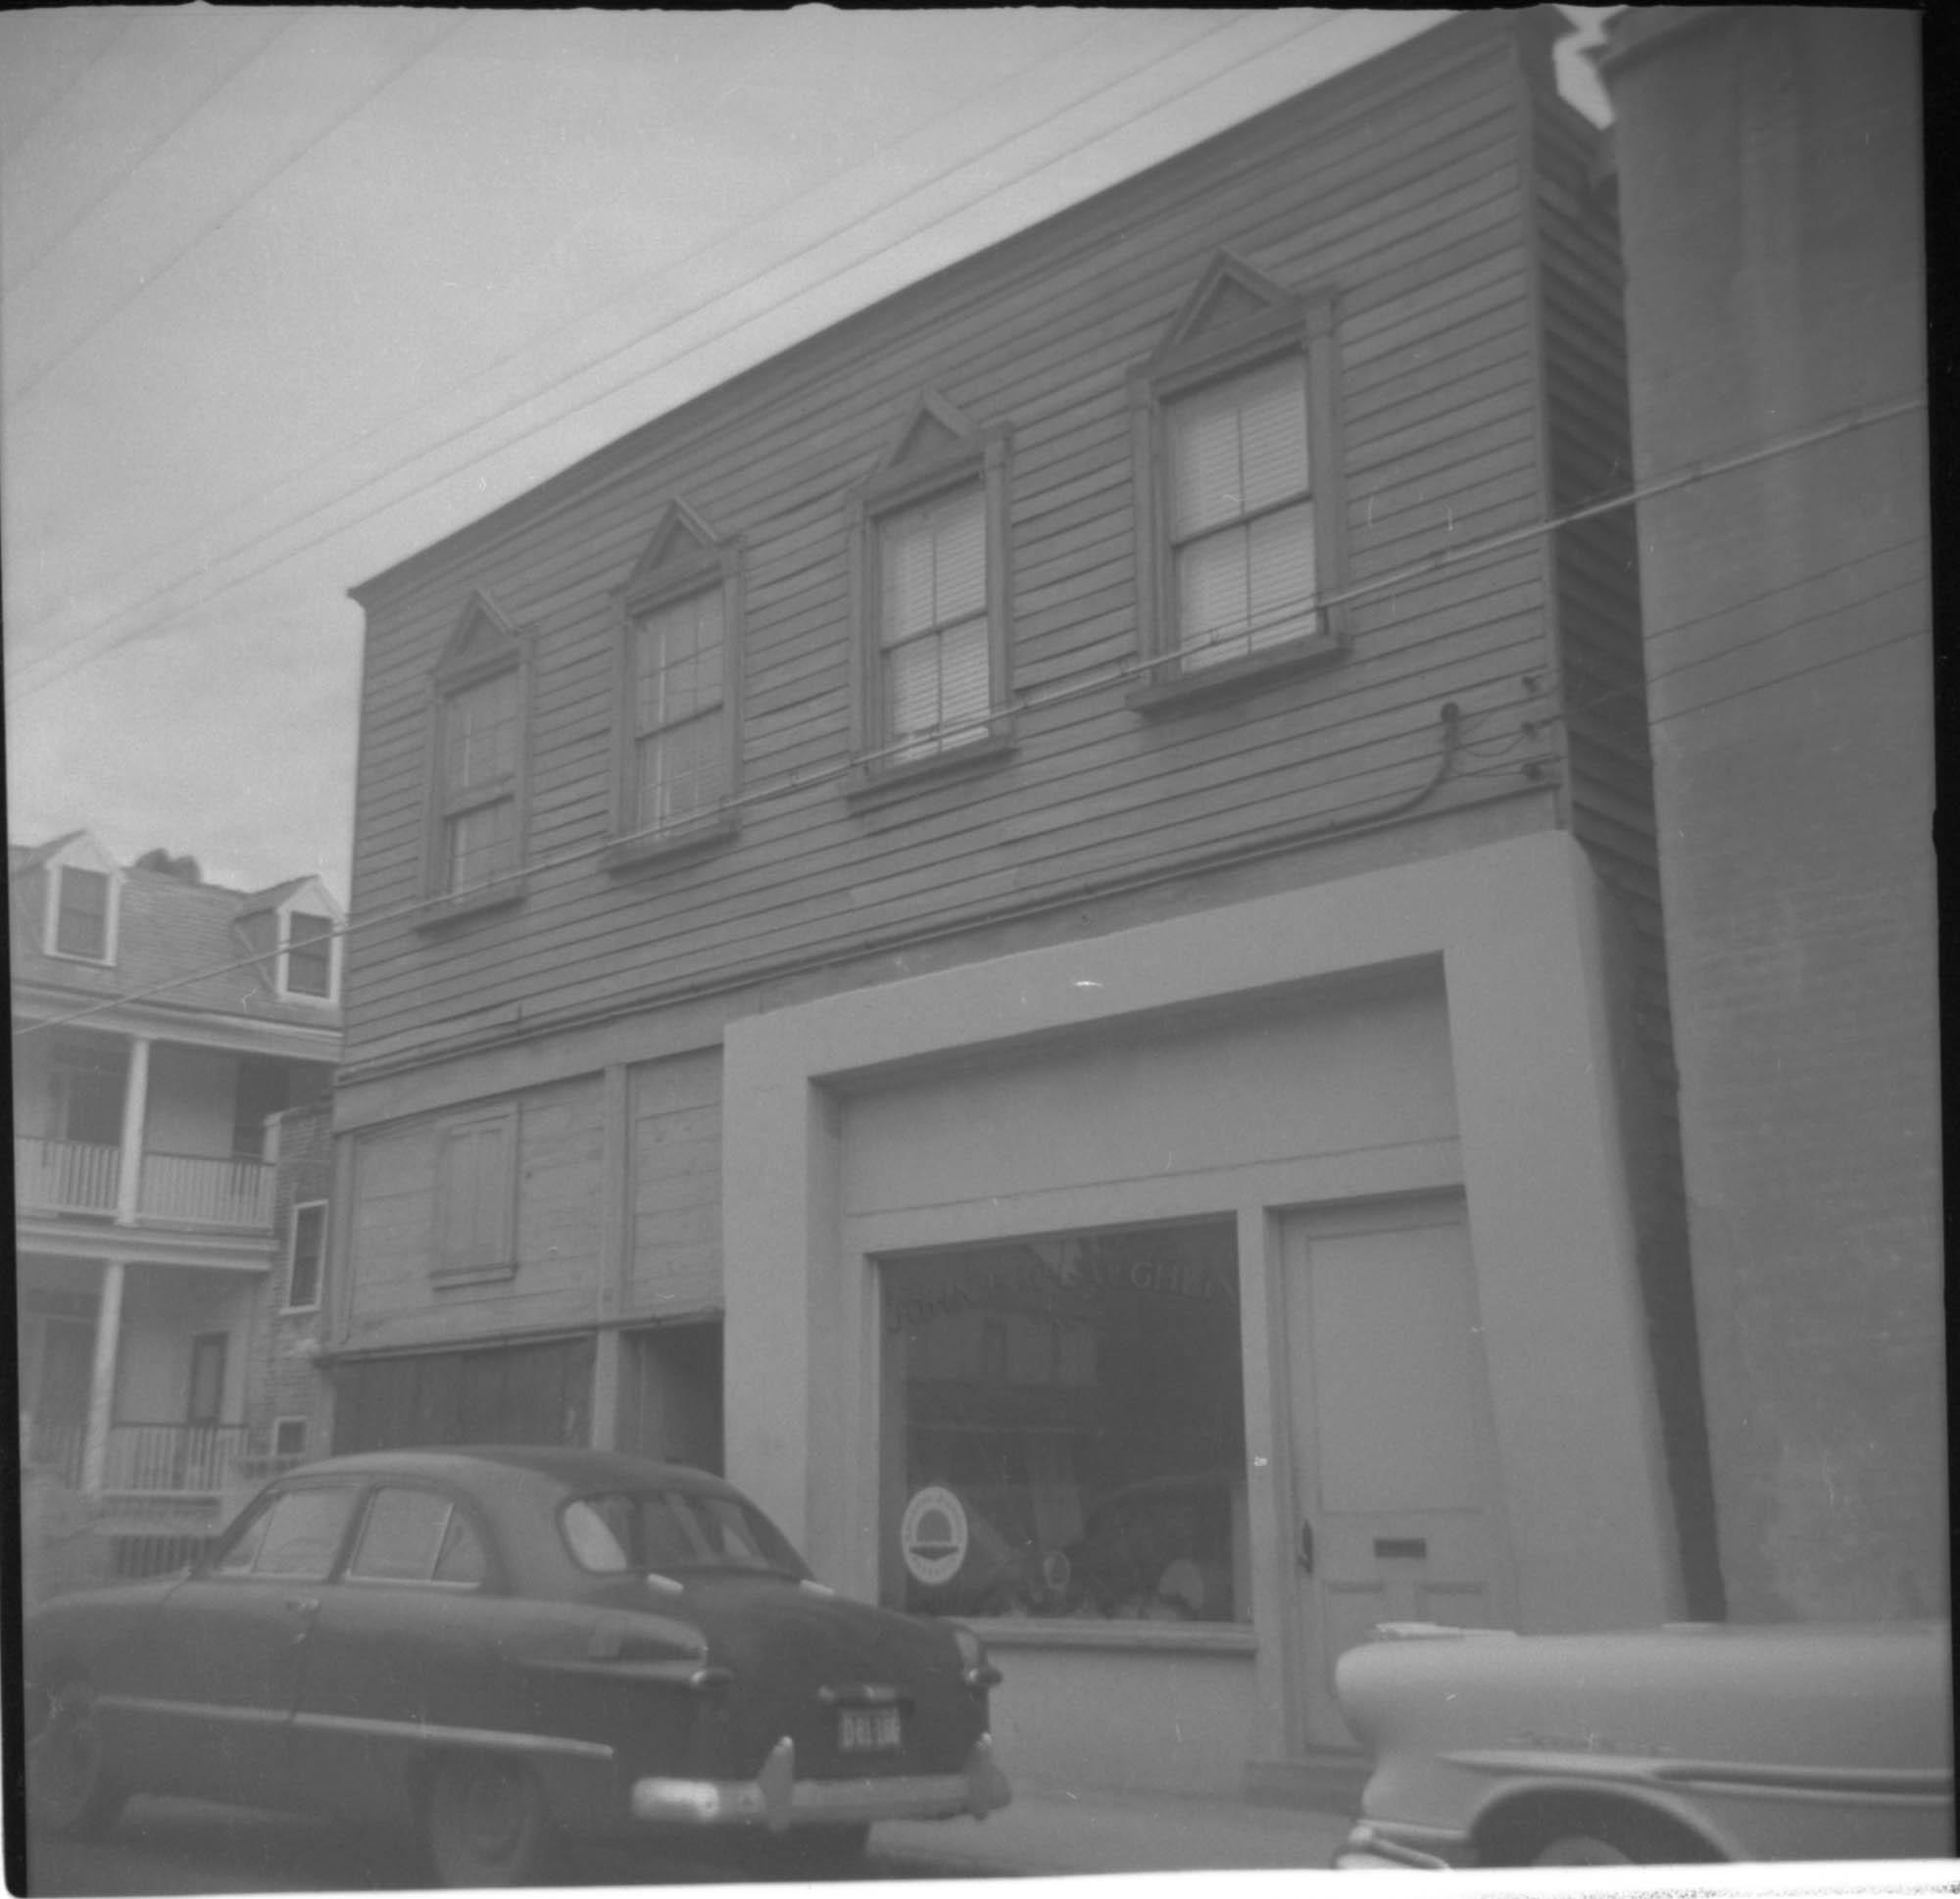 54 Anson Street